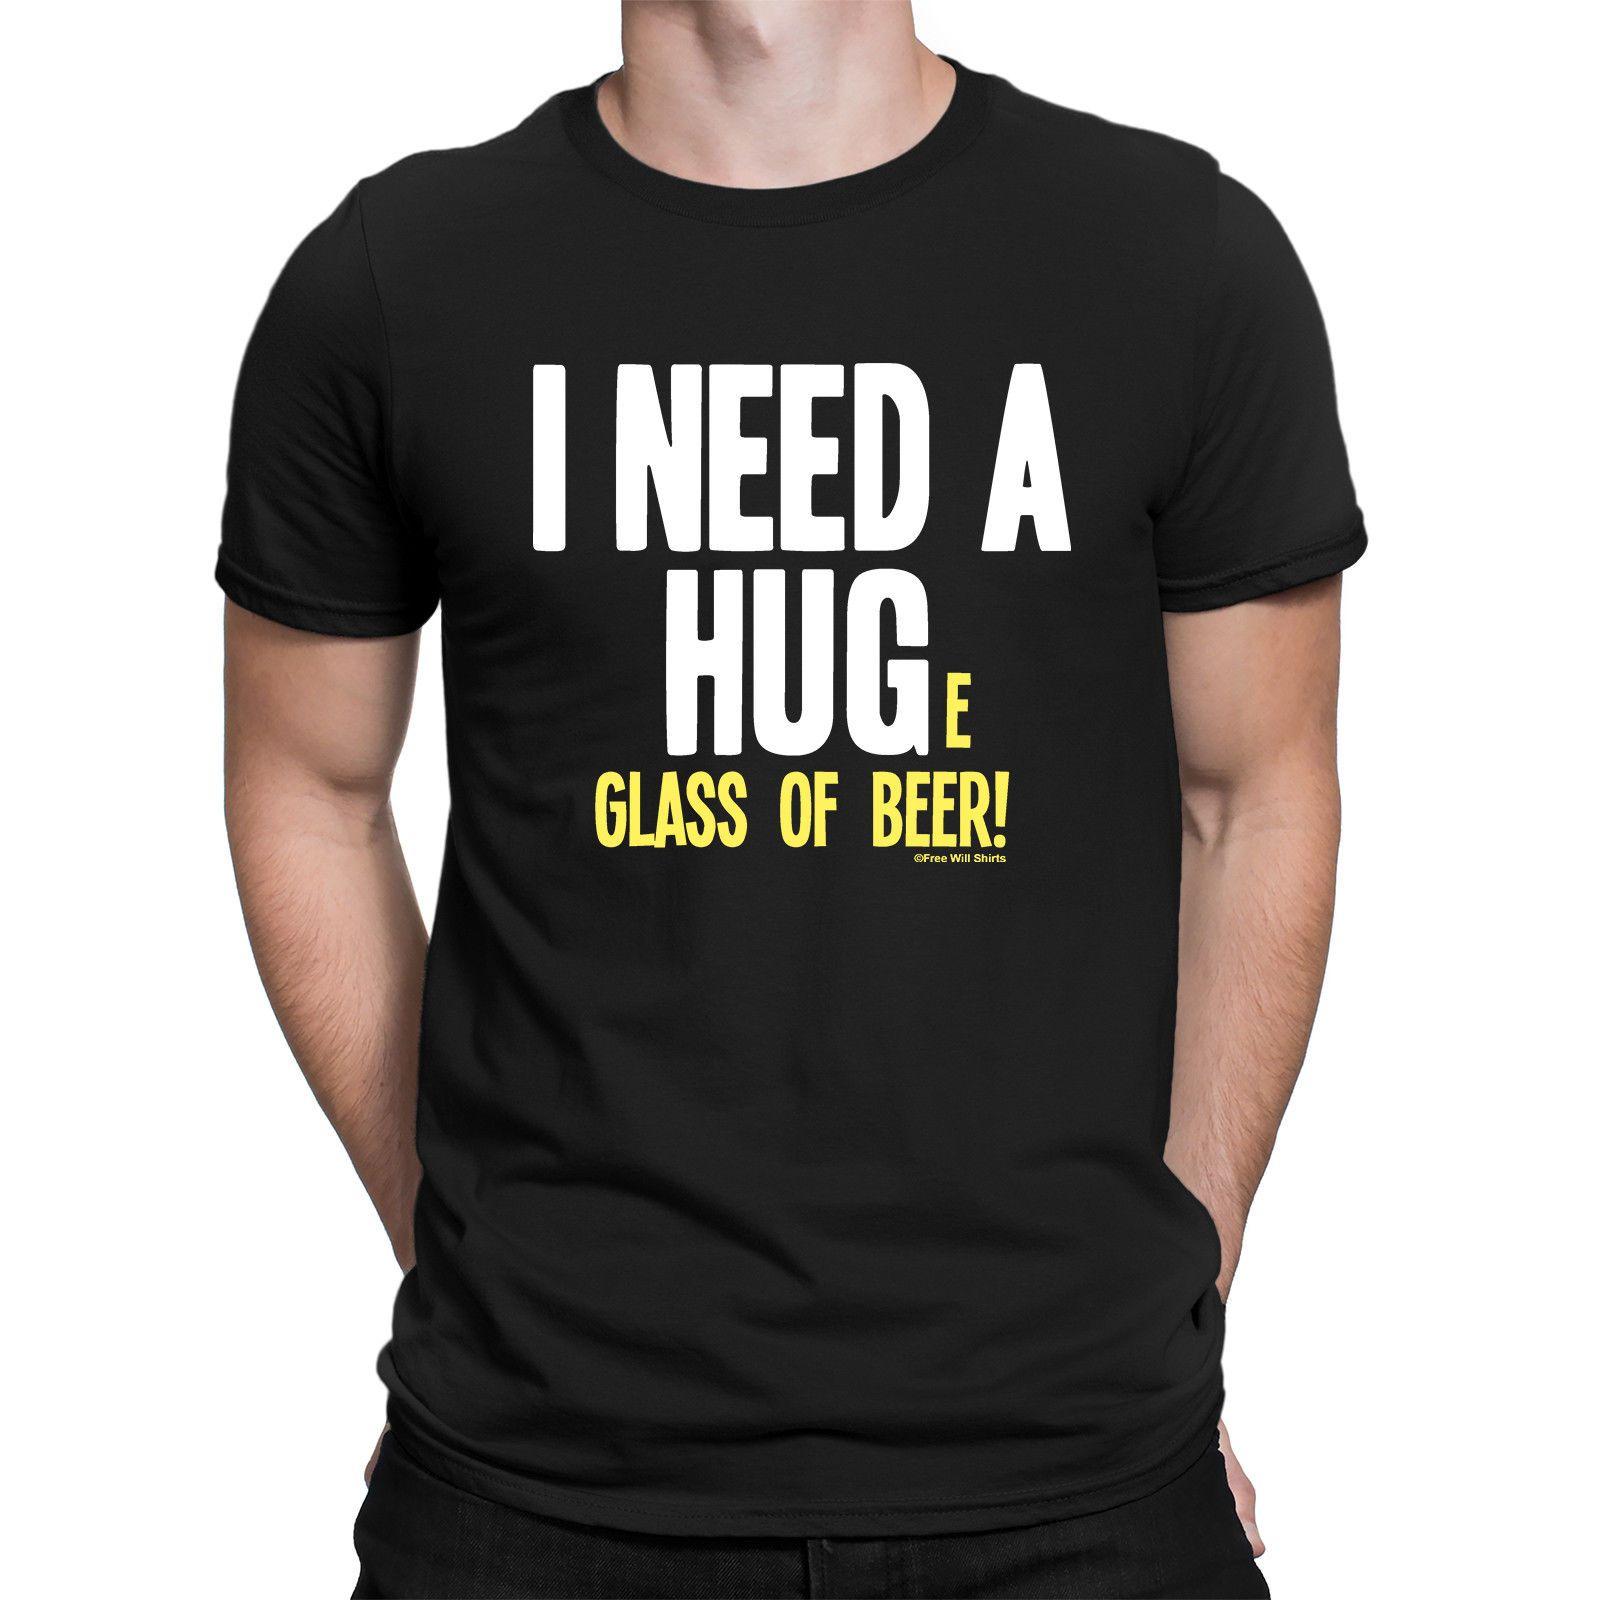 New Men/'s American Tuxedo Long Sleeve Black T Shirt Funny Tee Classy Fancy Humor